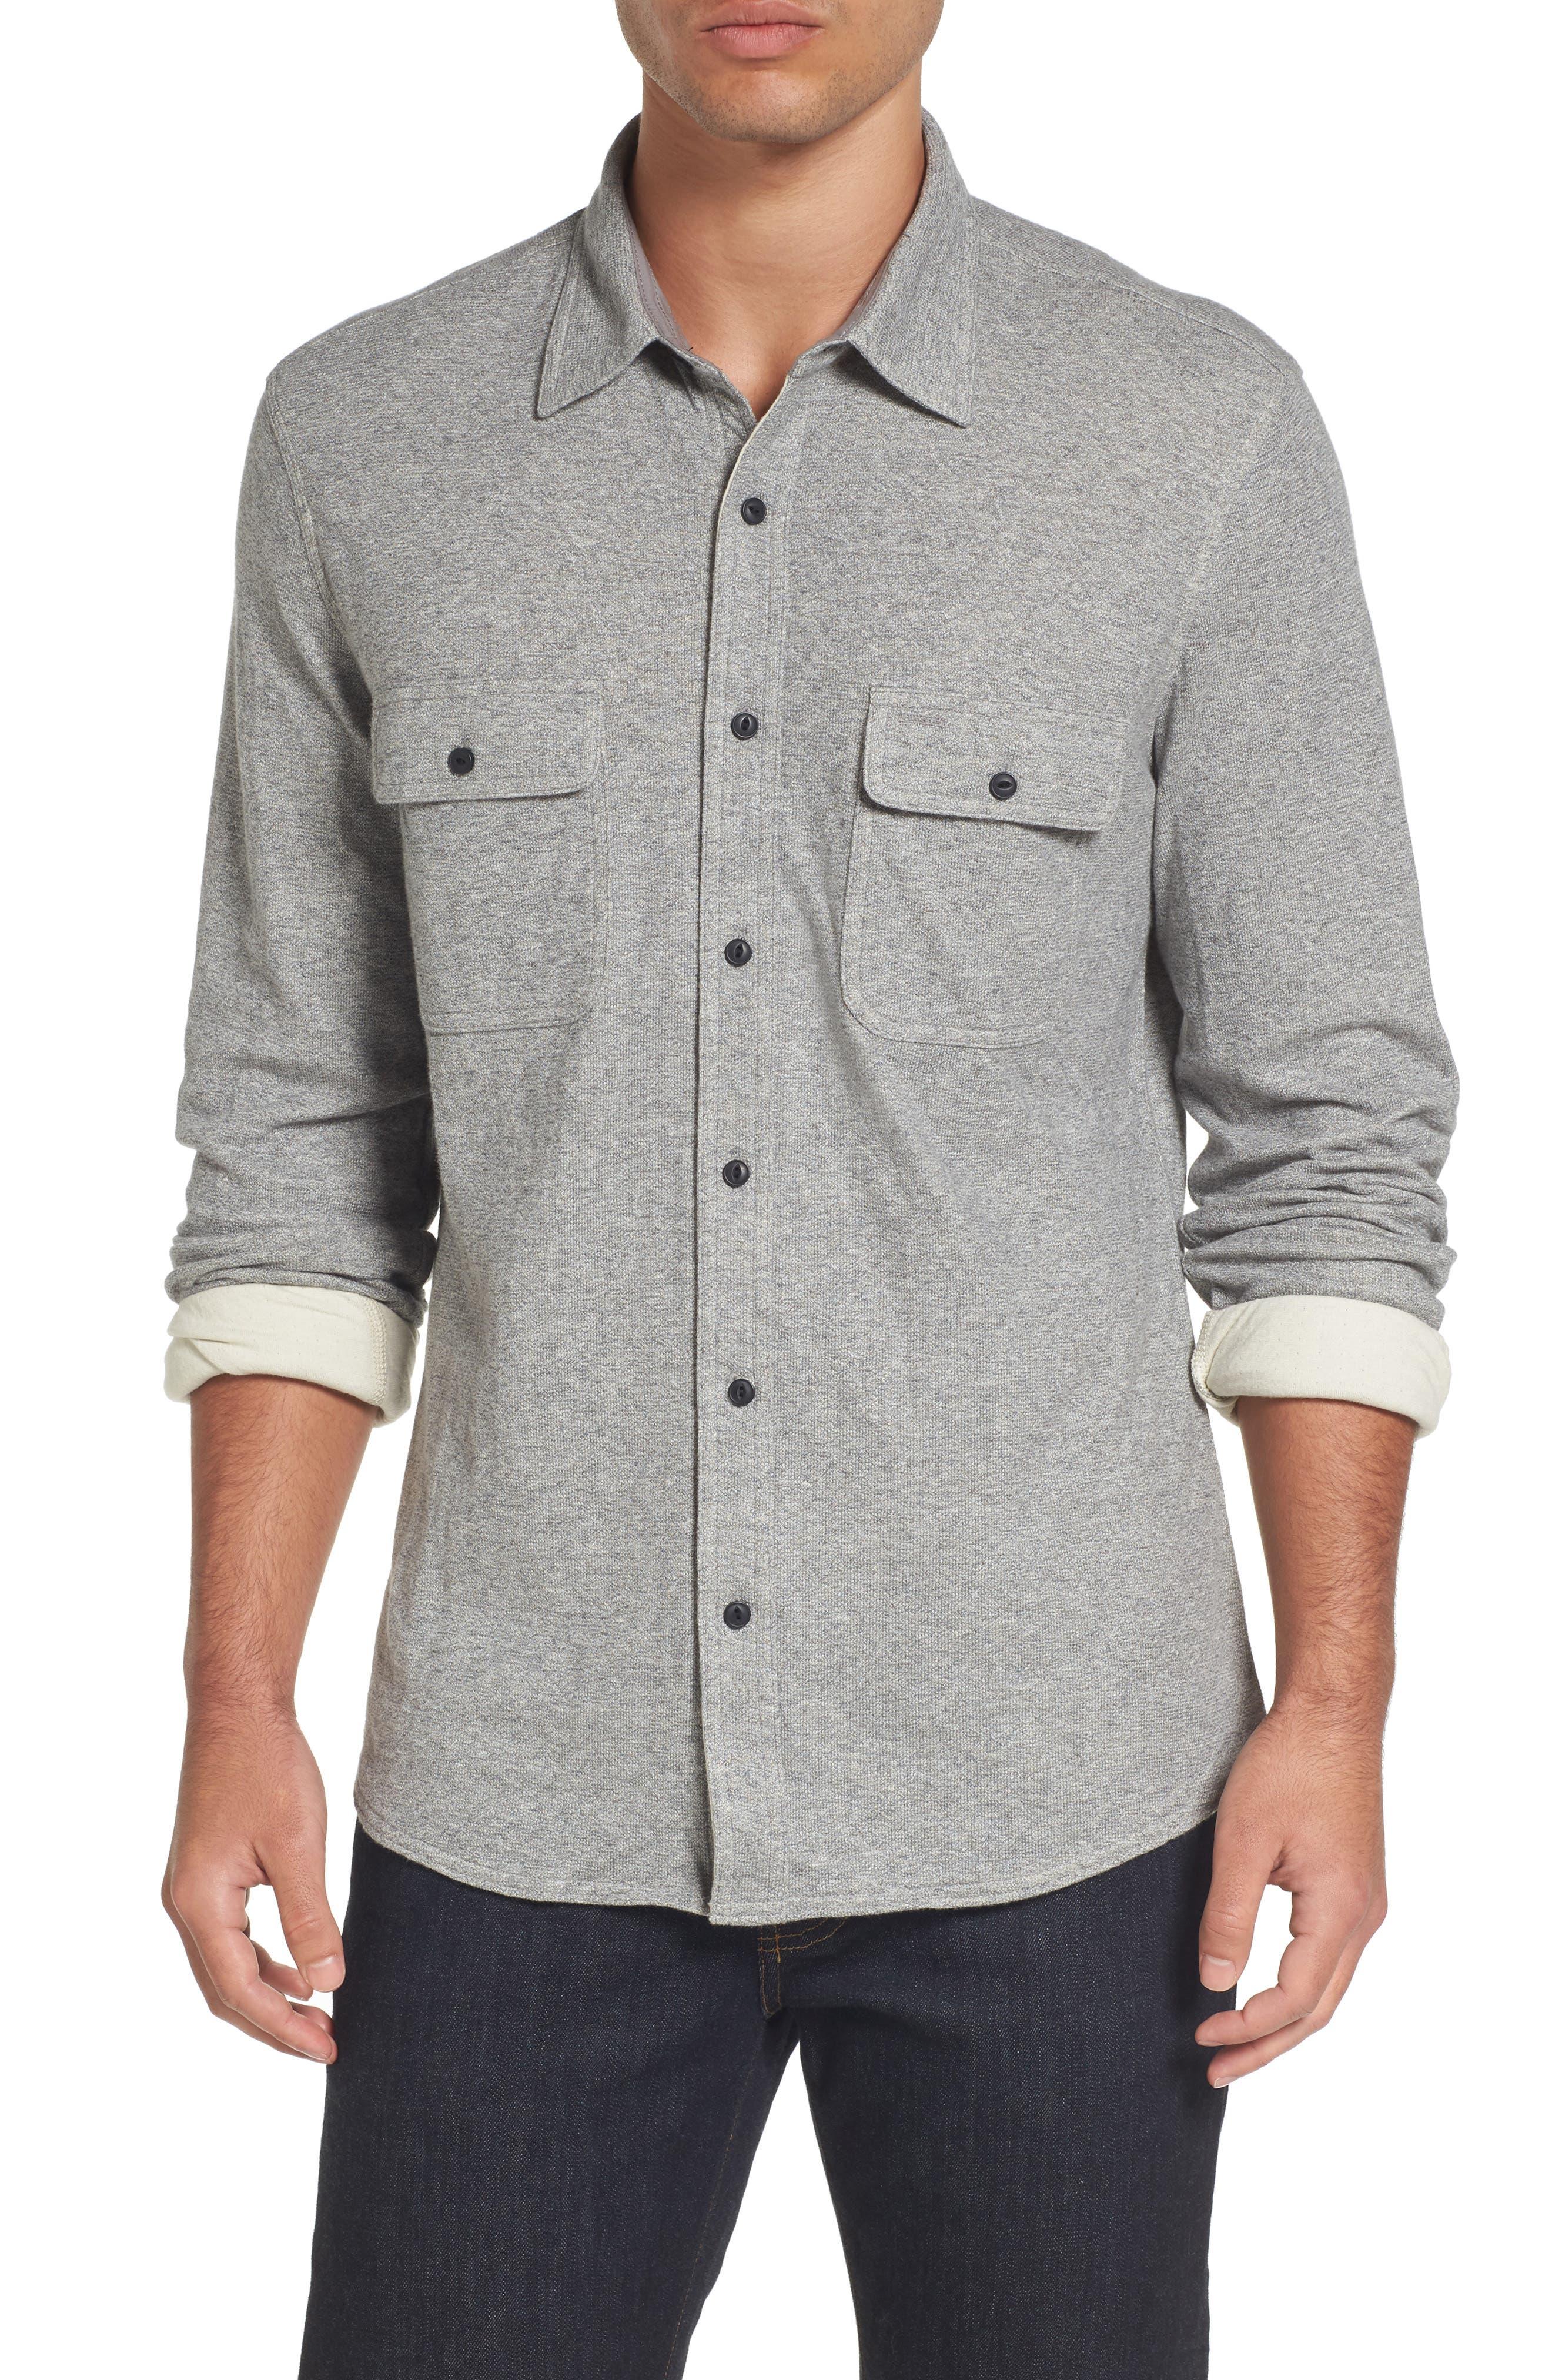 Nordstrom Men's Shop Trim Fit Knit Sport Shirt (Tall)